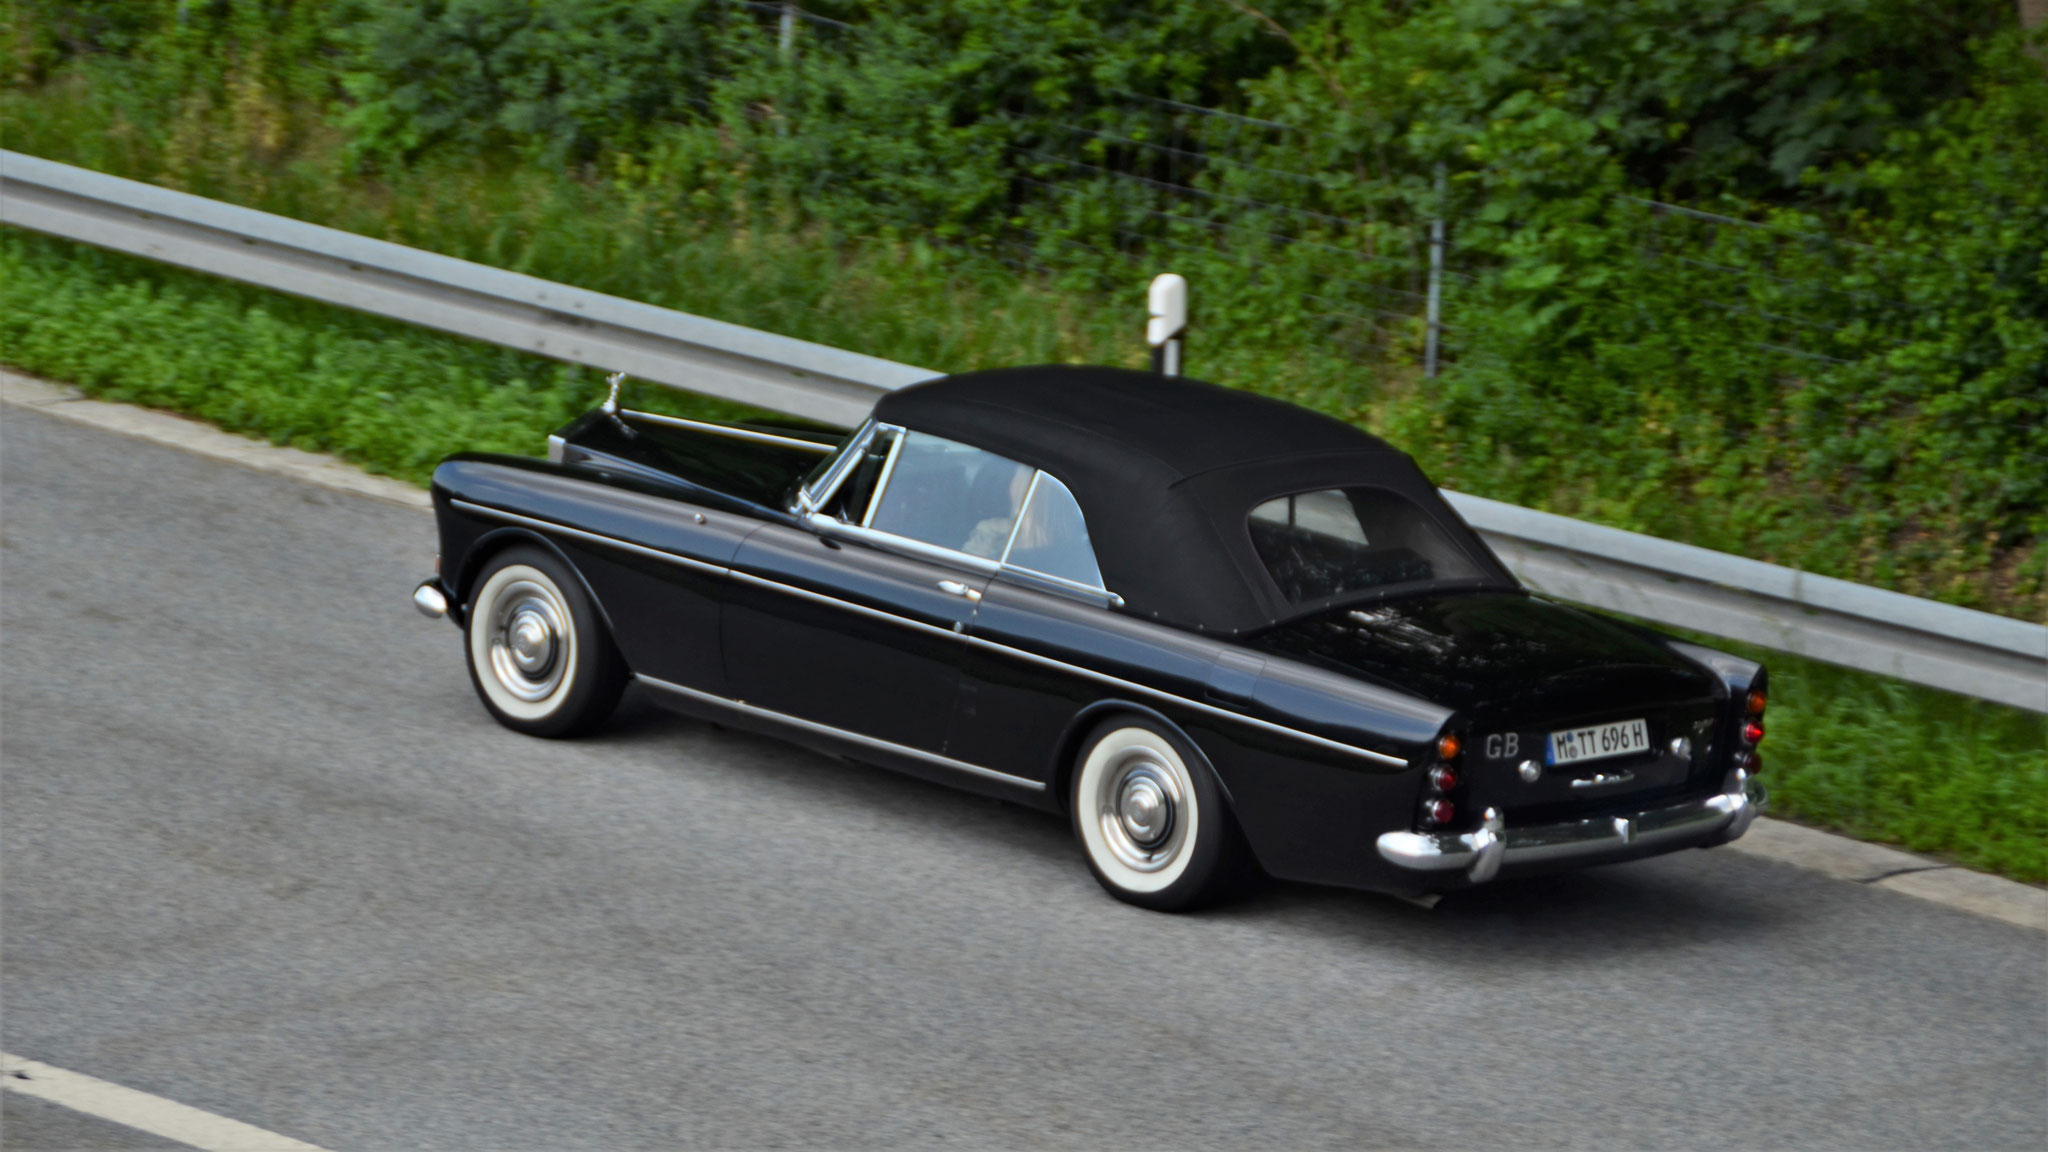 Rolls Royce Corniche - M-TT-696H